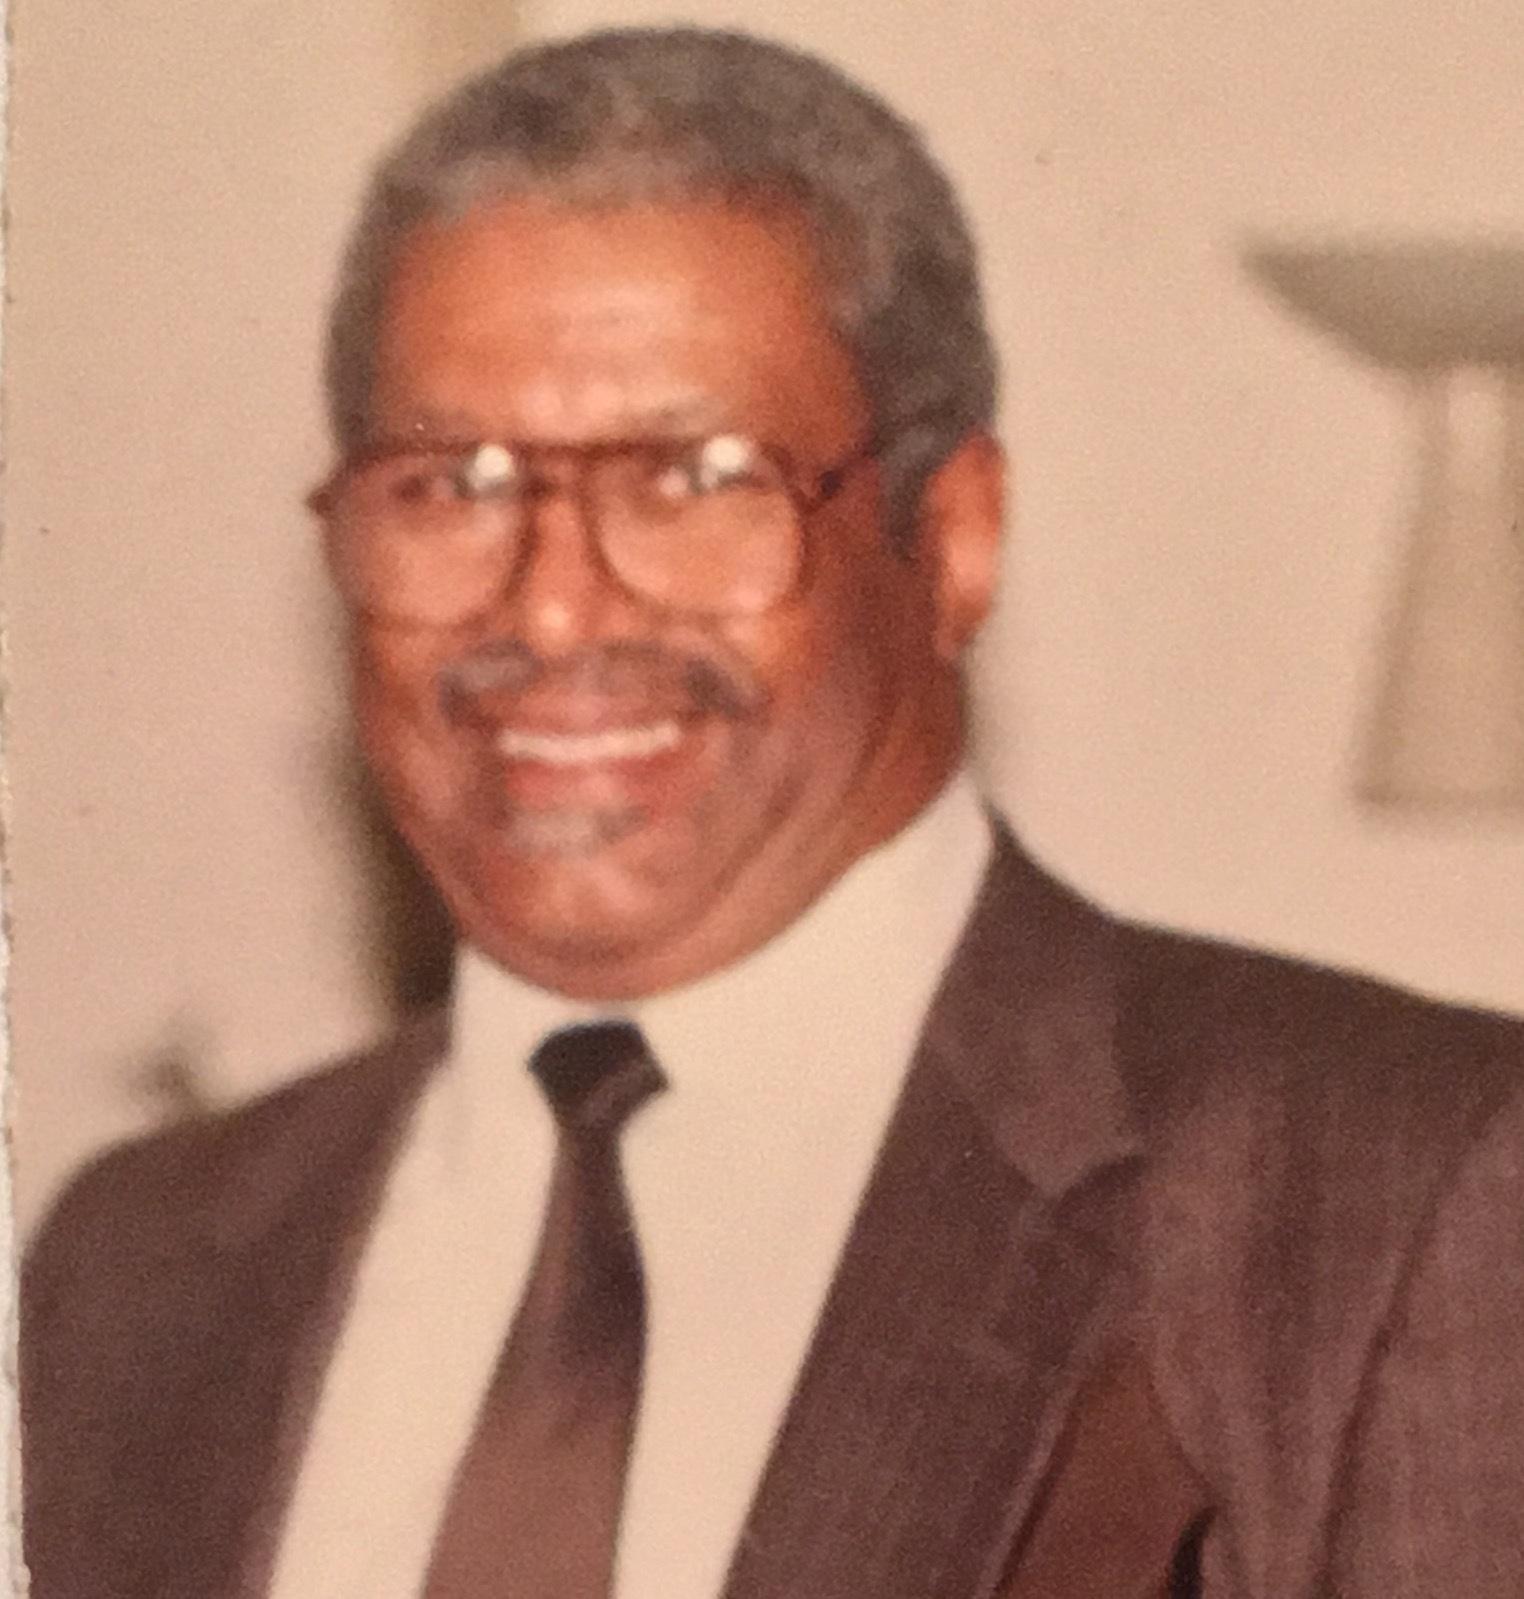 Alonzo Eugene Williams